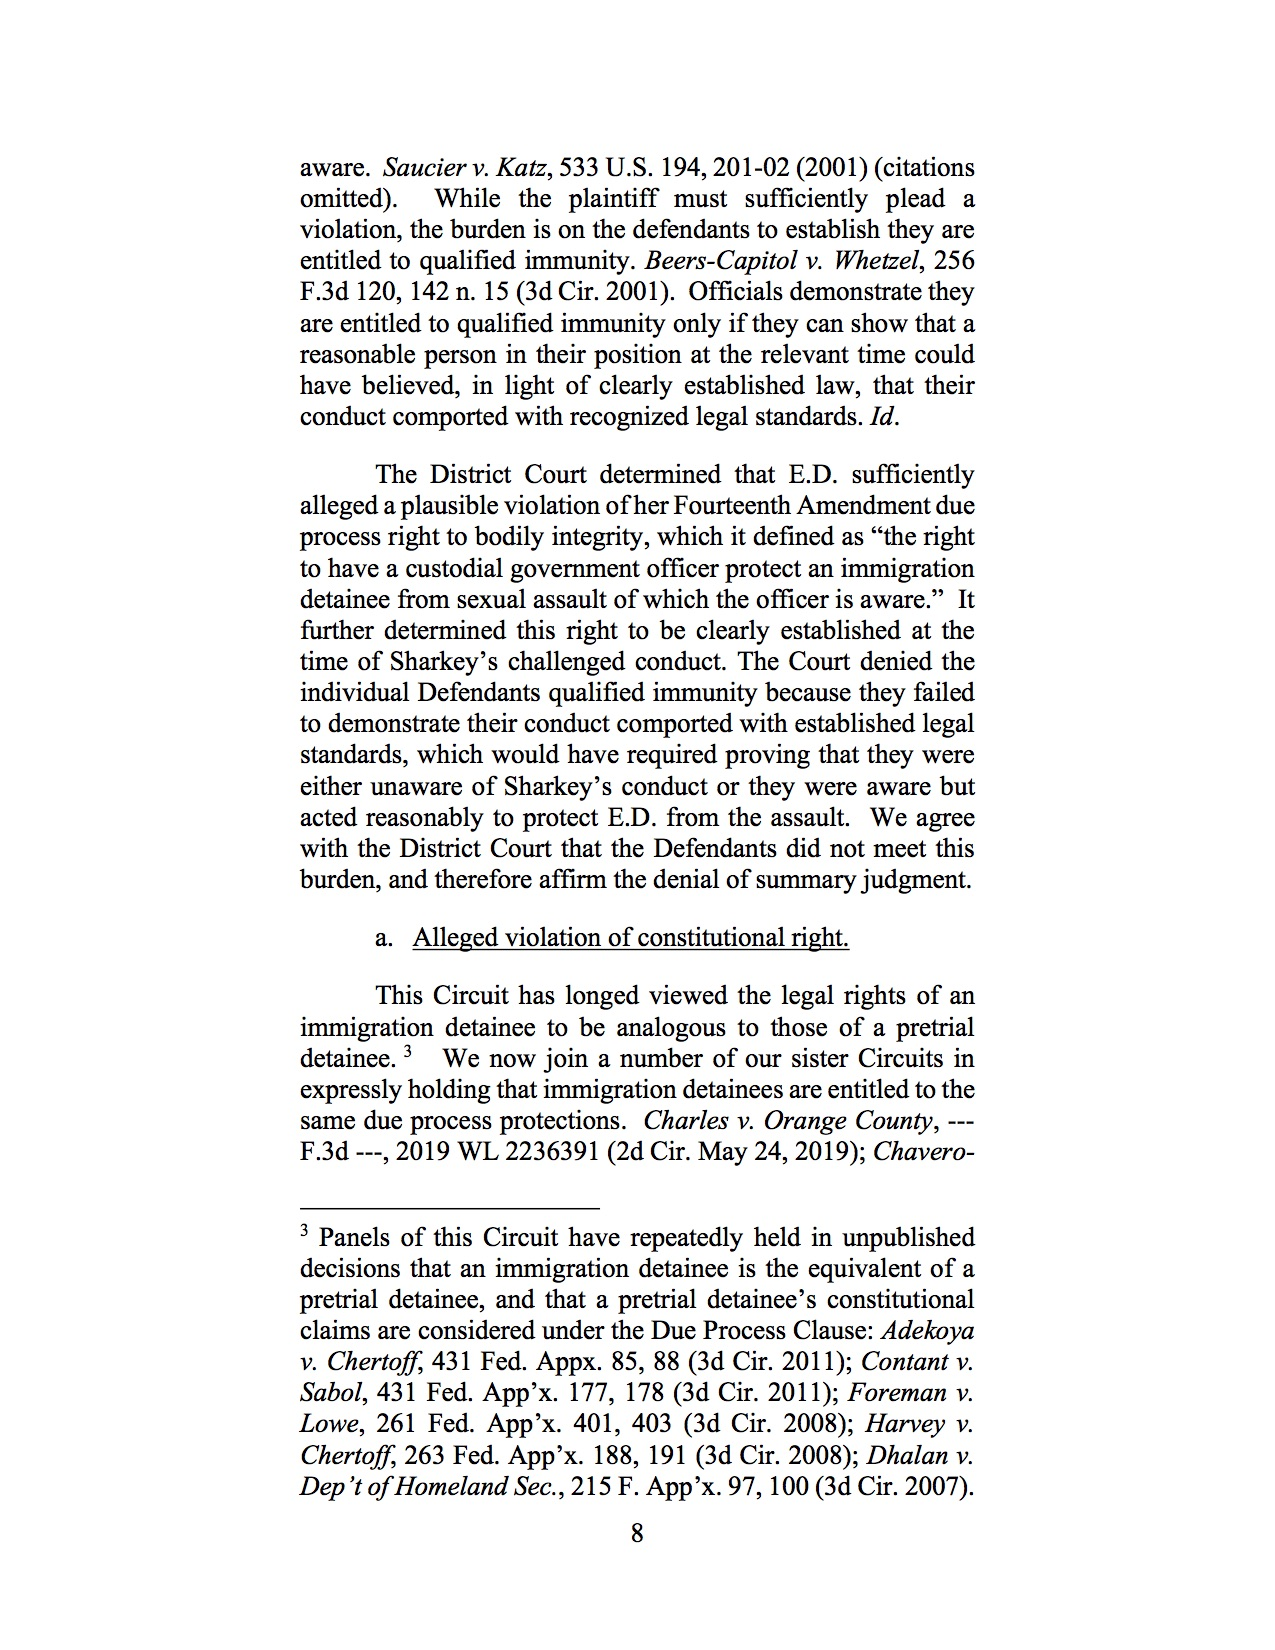 E.D. v. Sharkey 3rd Circuit Opinion.8.jpg